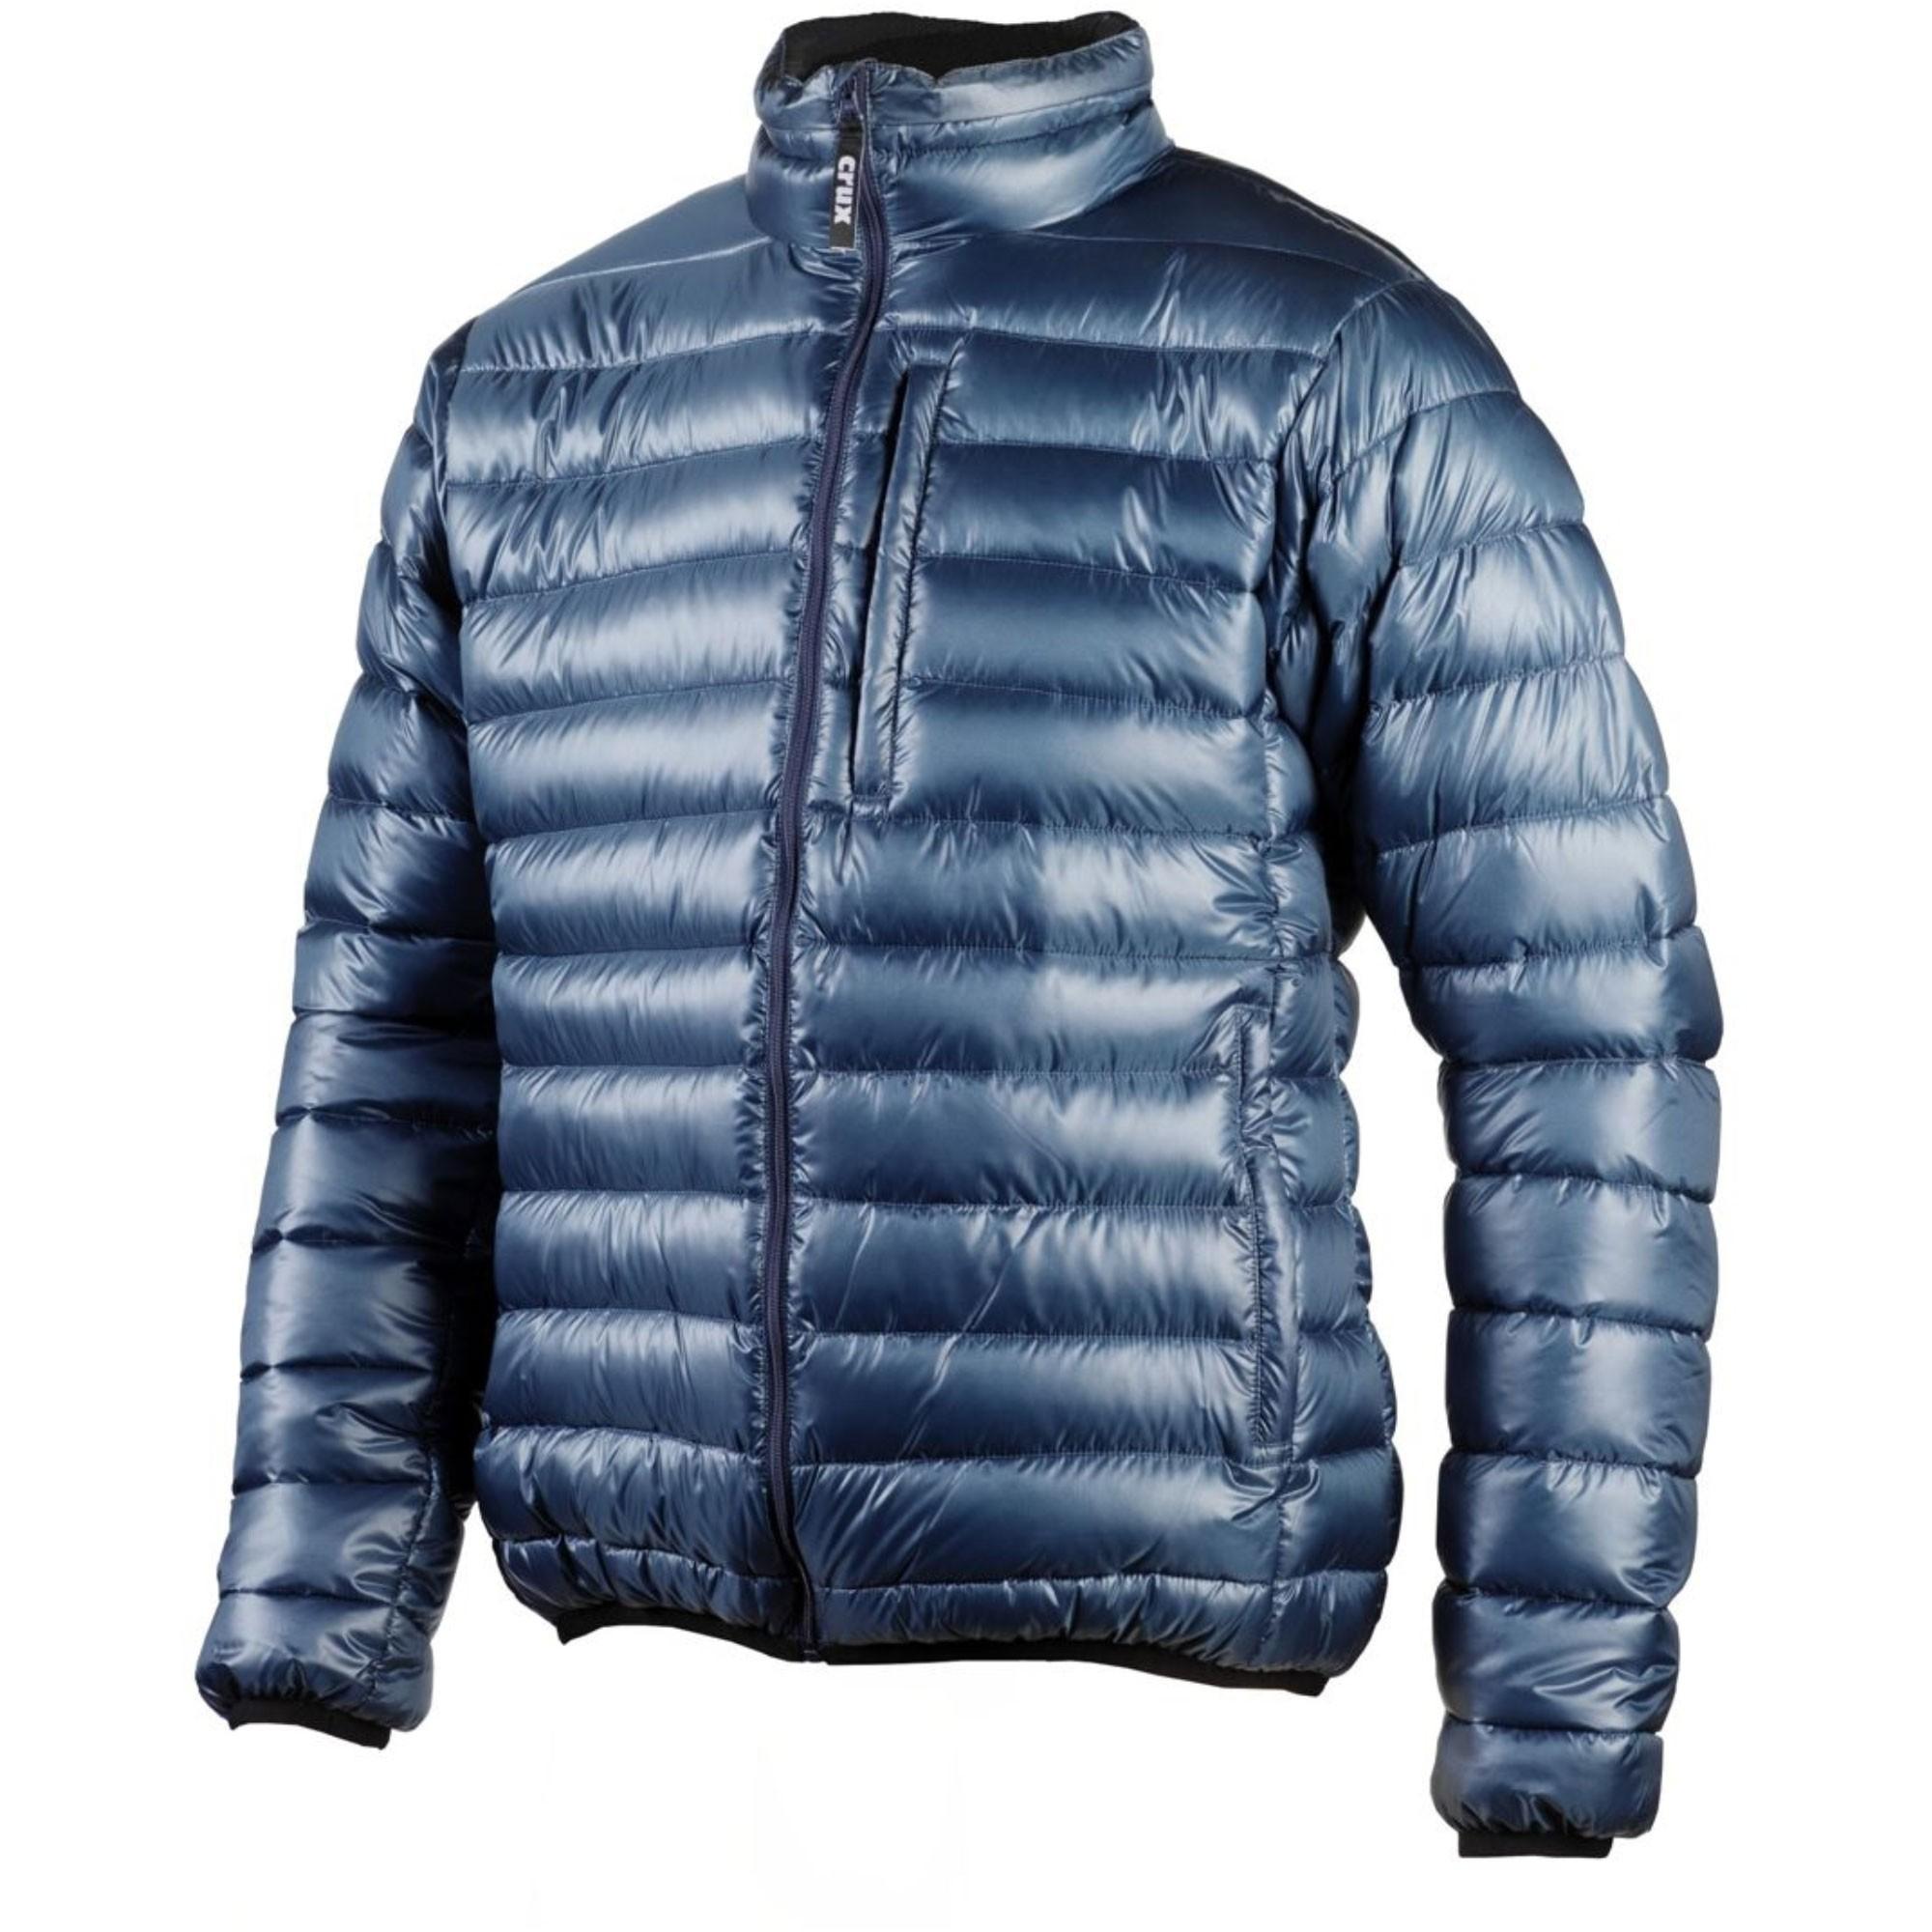 Crux Pyro Down Jacket - Diesel Blue